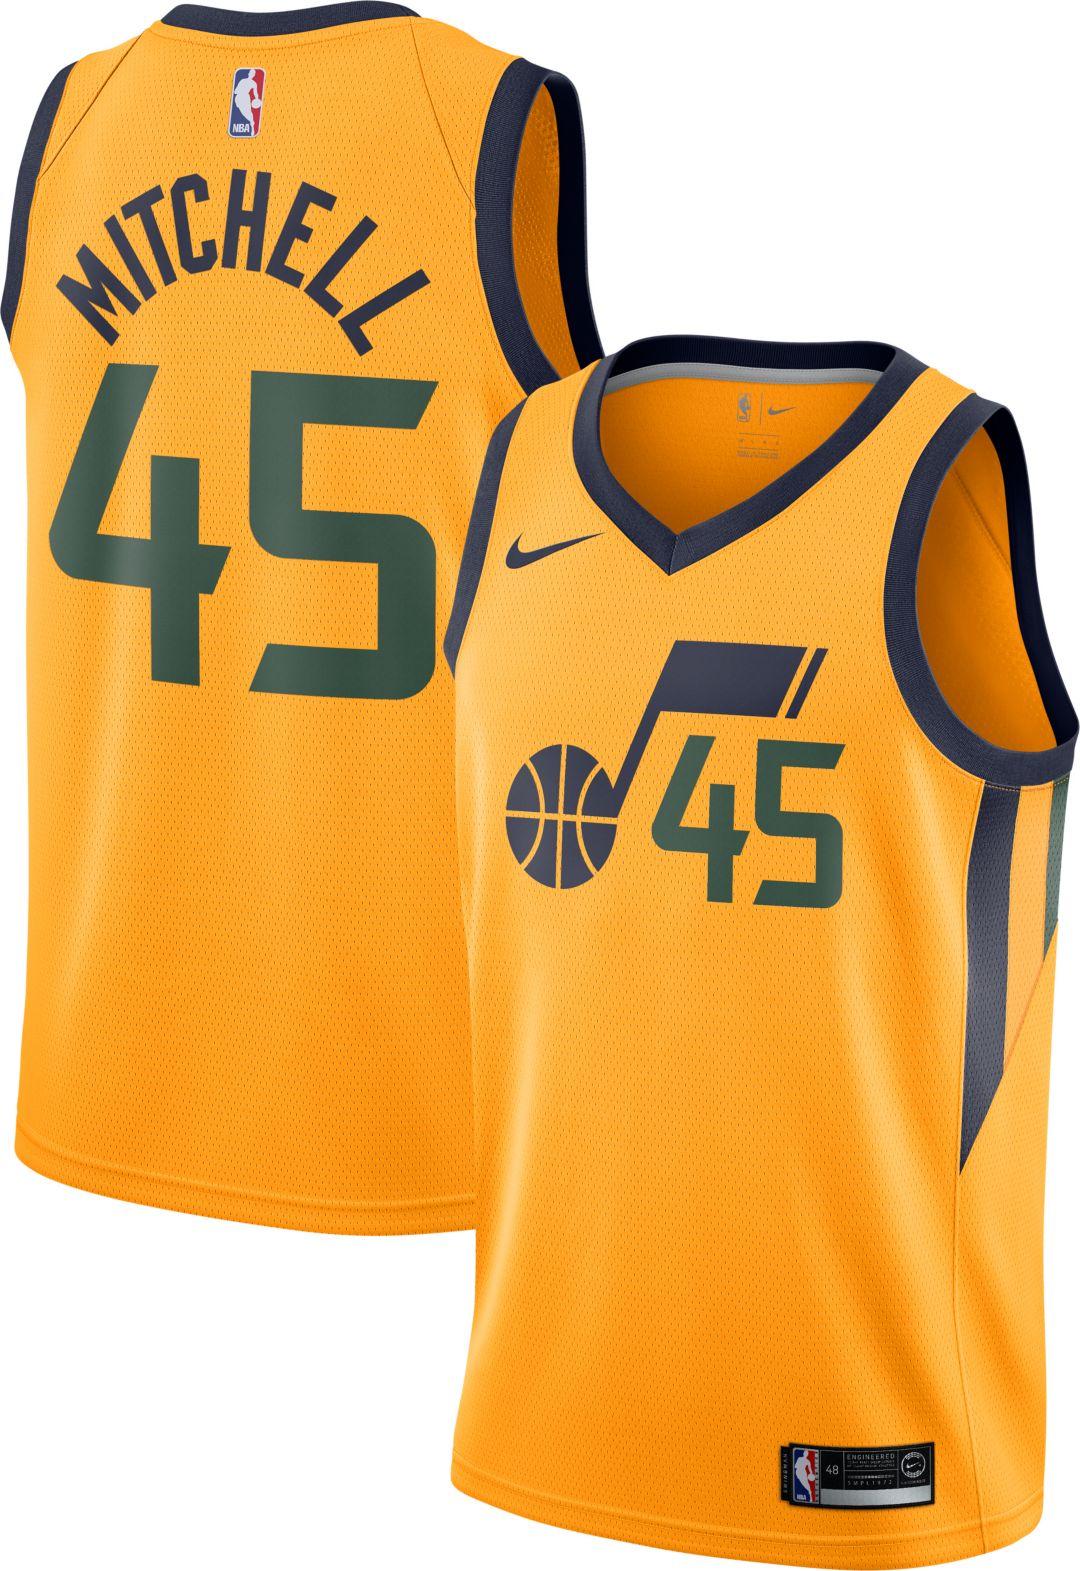 official photos 67800 8e40c Nike Men's Utah Jazz Donovan Mitchell #45 Gold Dri-FIT Swingman Jersey